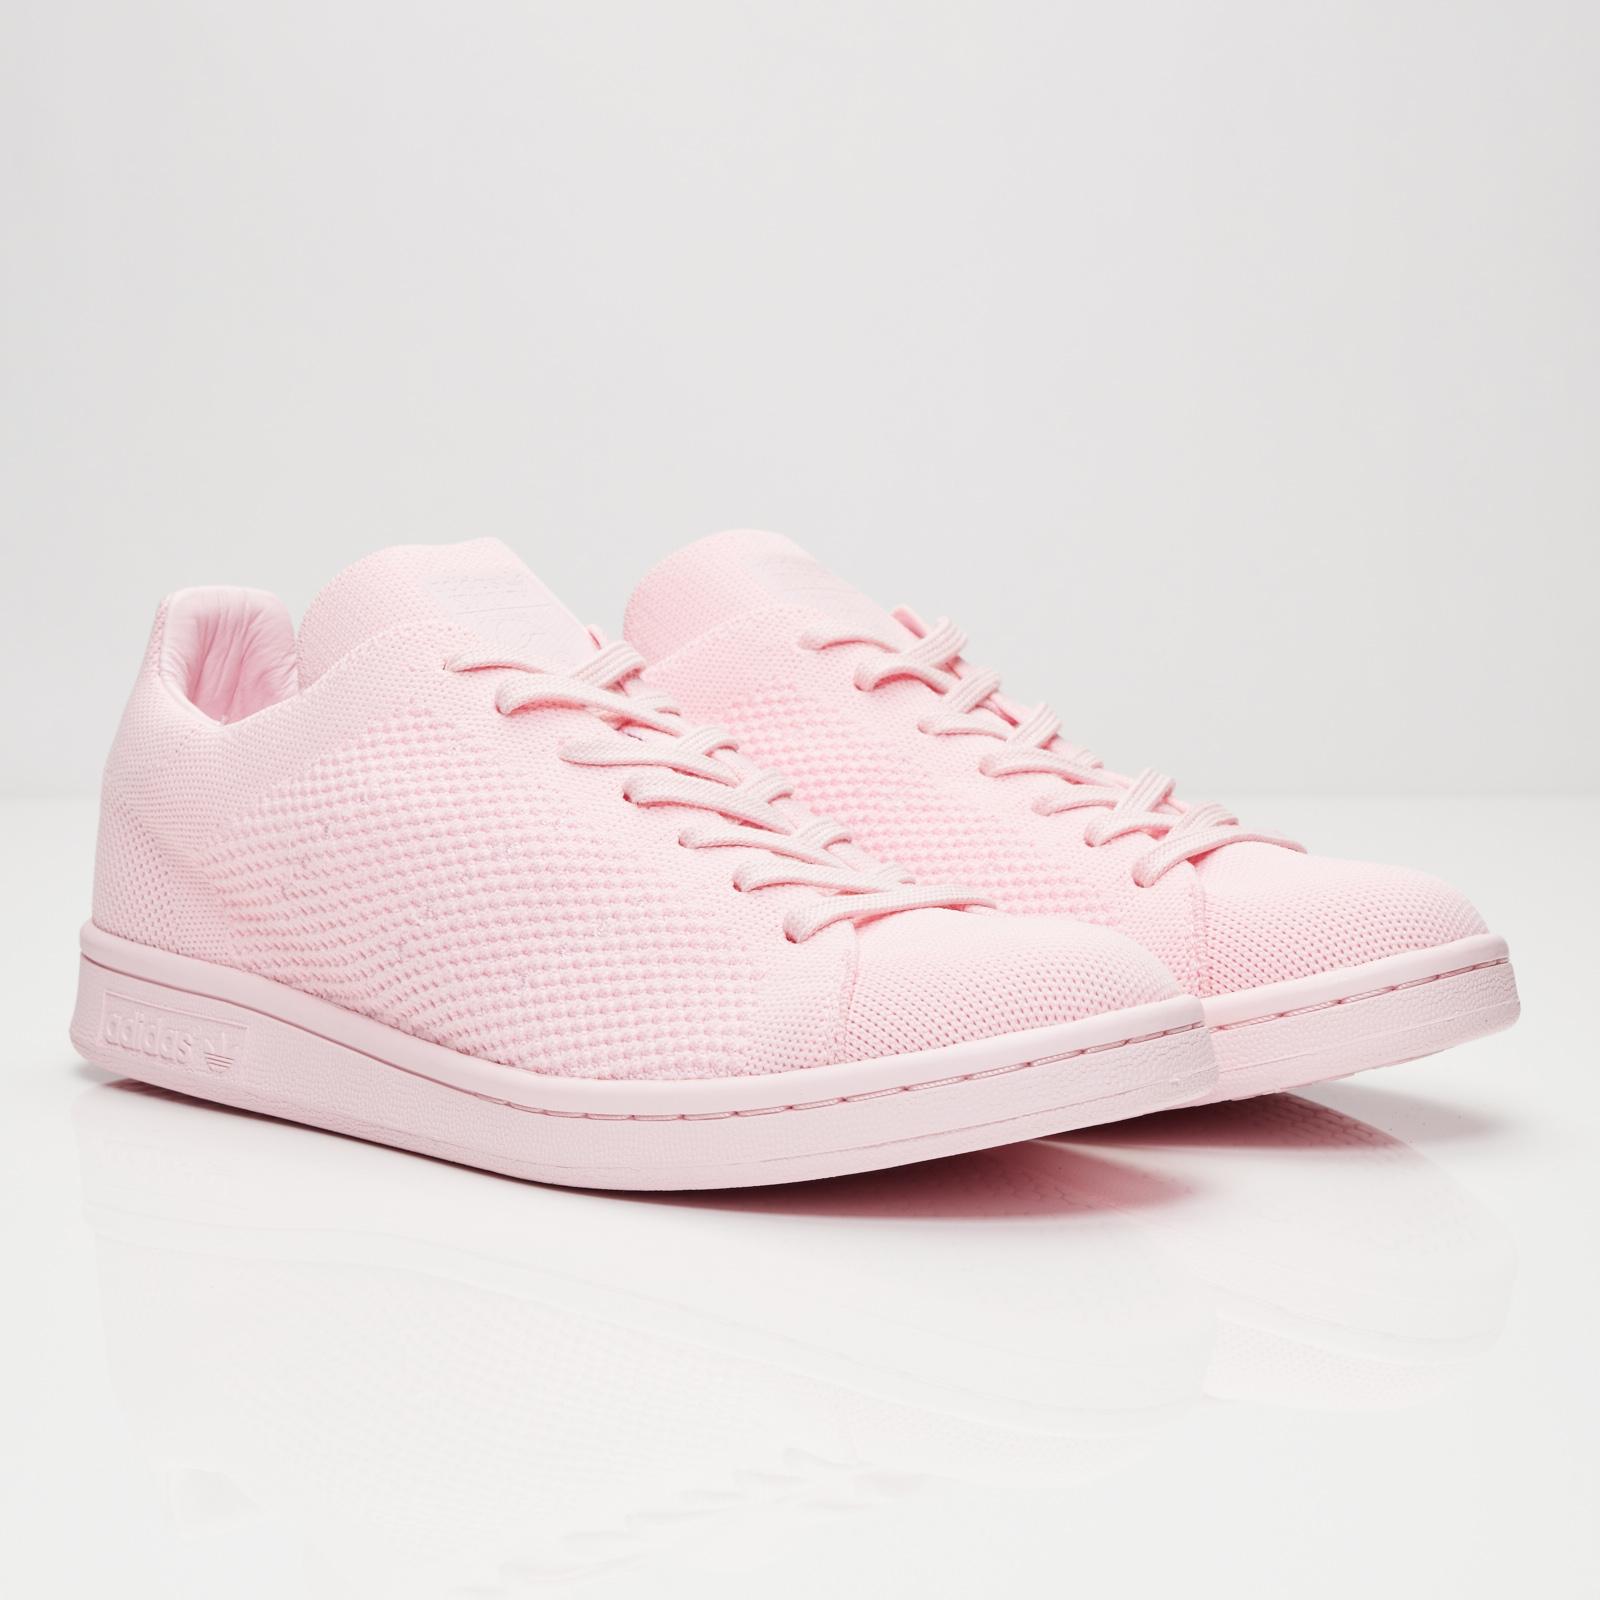 primeknit s s primeknit Basketsnstuff baskets adidas stan smith a466da